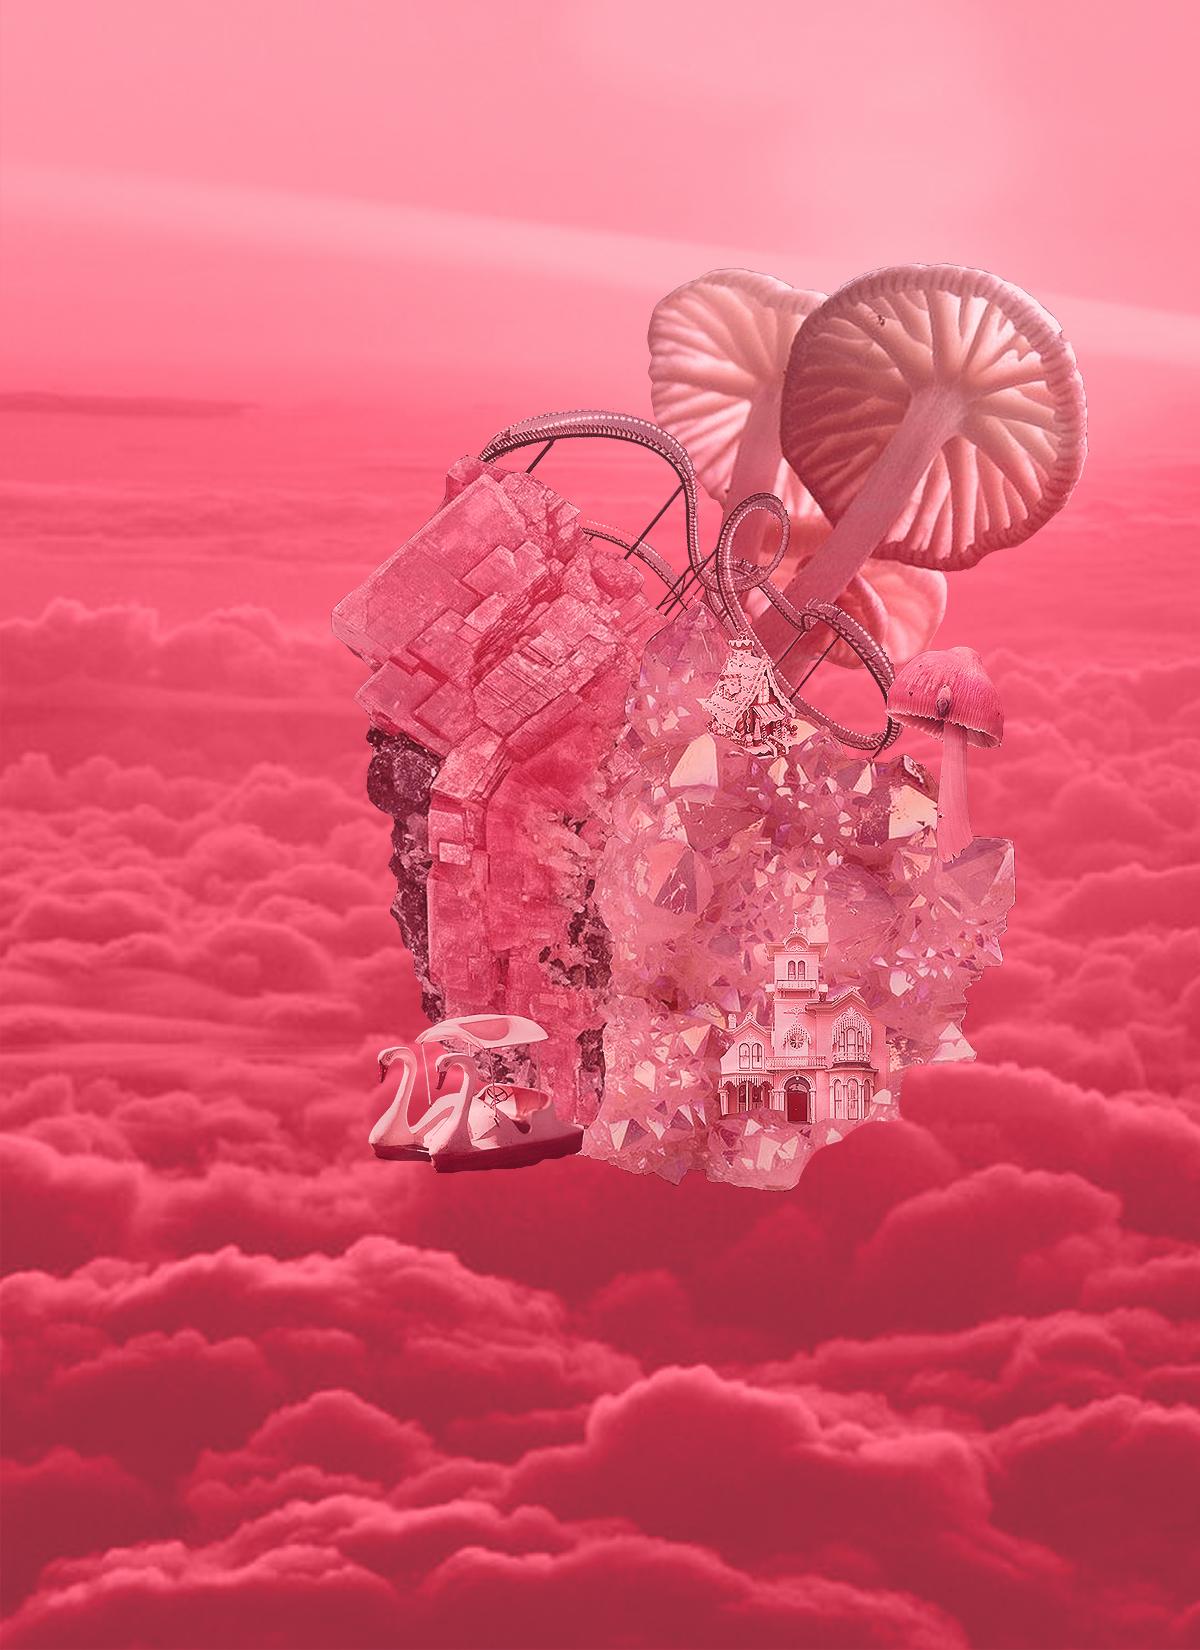 Bubblepopelectric.jpg